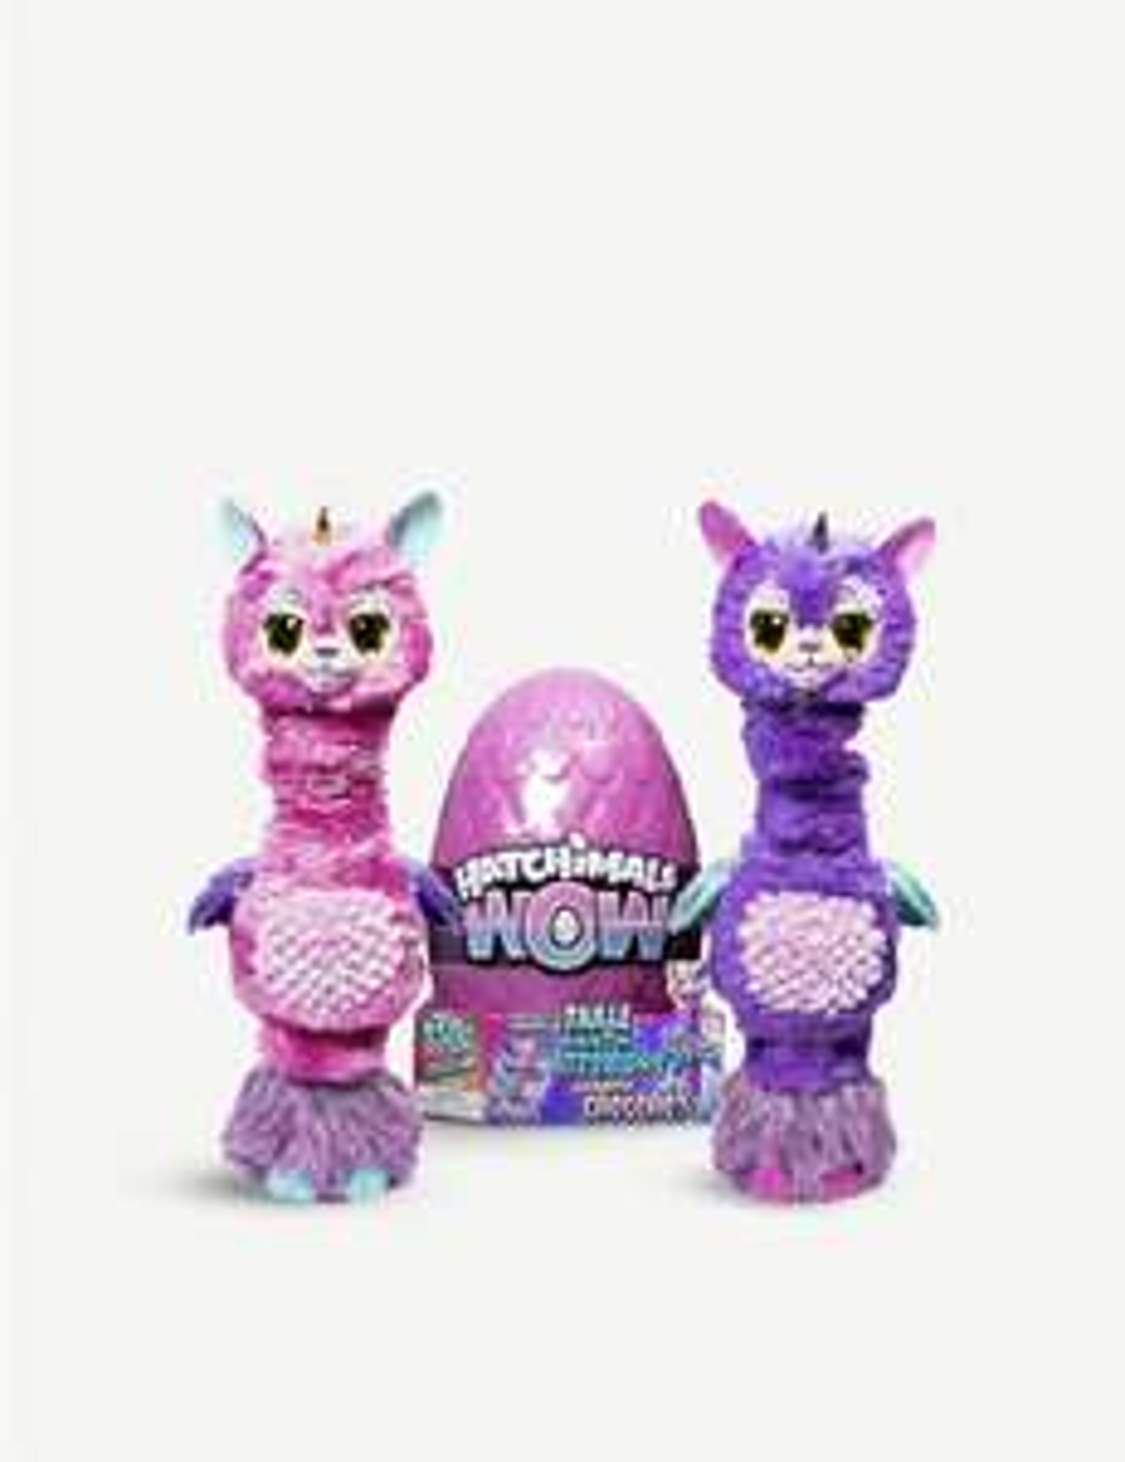 Hatchimals Hatchiwow Llalacorn Interactive Plush Toy £39.99 @ TheToyShop.com (The Entertainer)